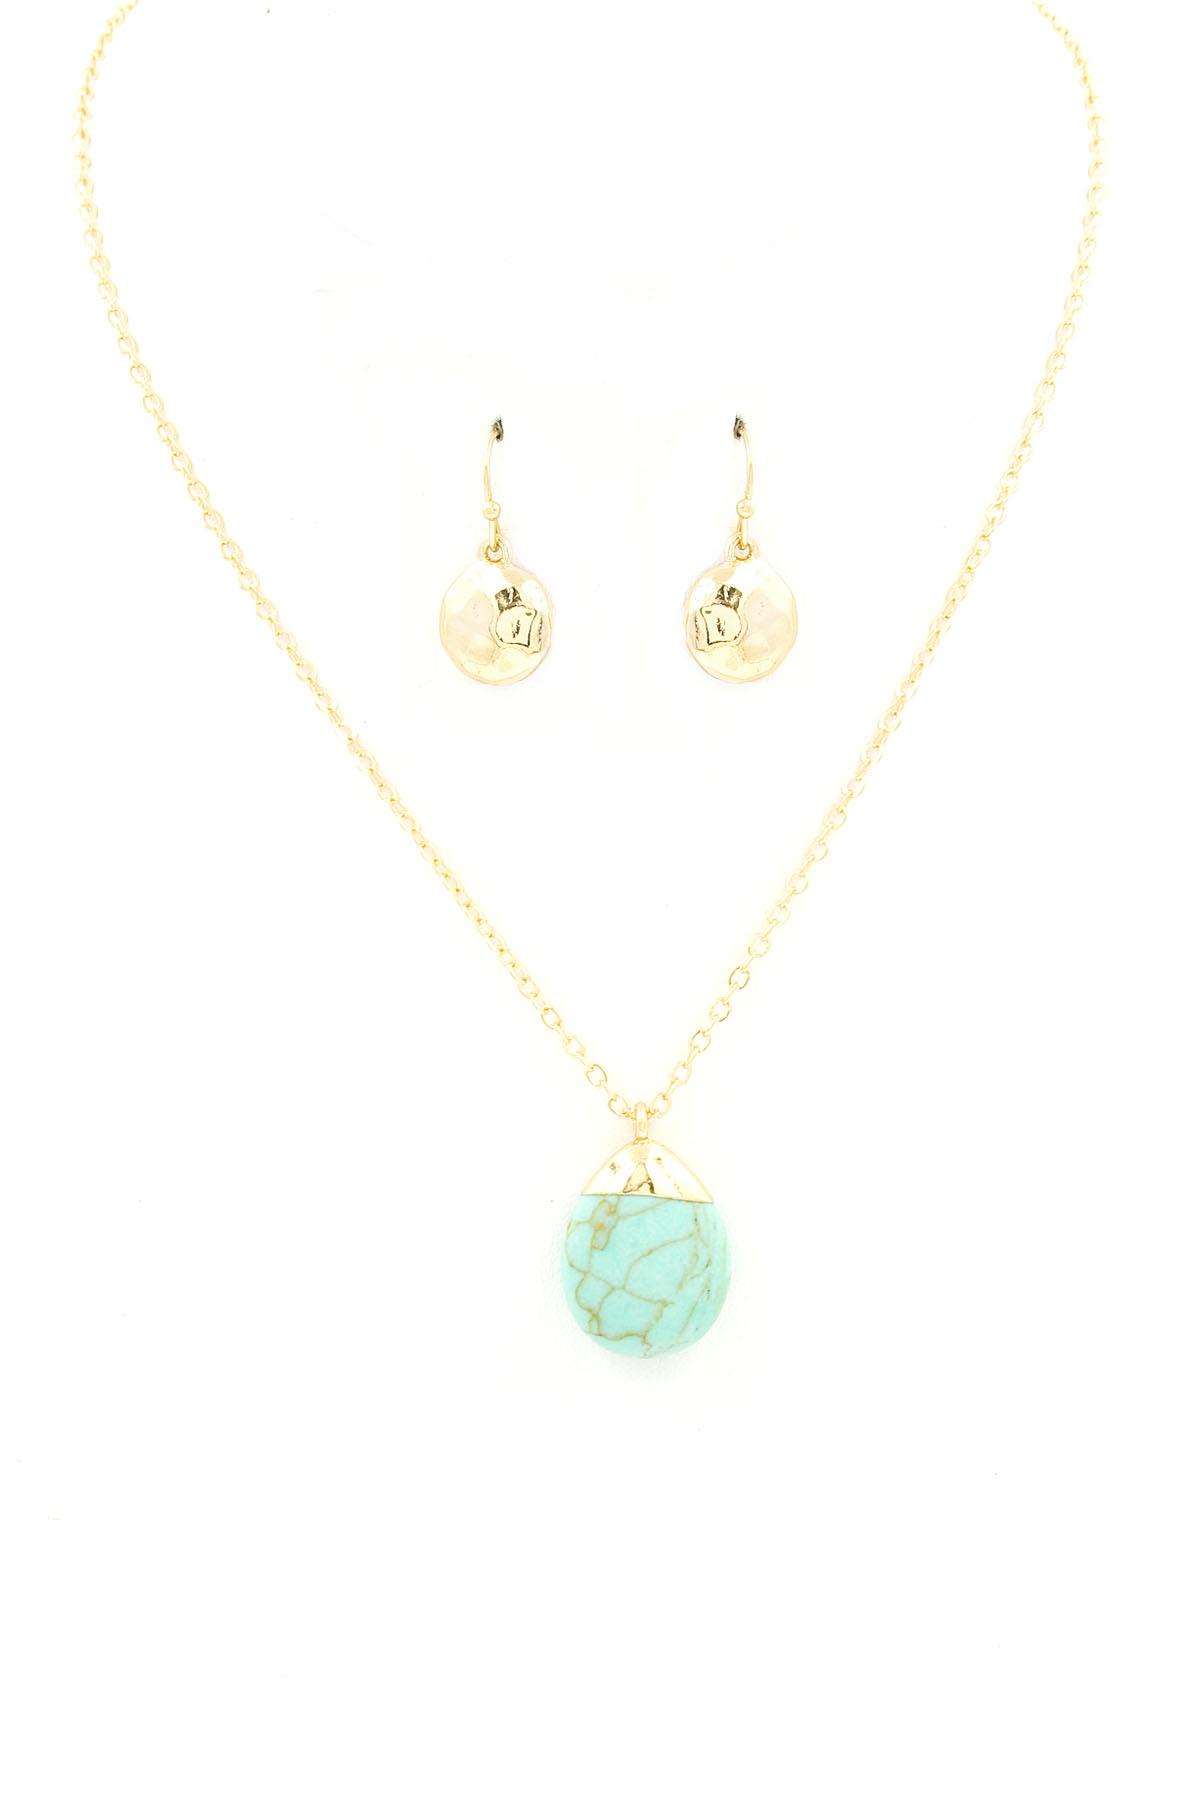 teardrop pendant necklace set necklaces